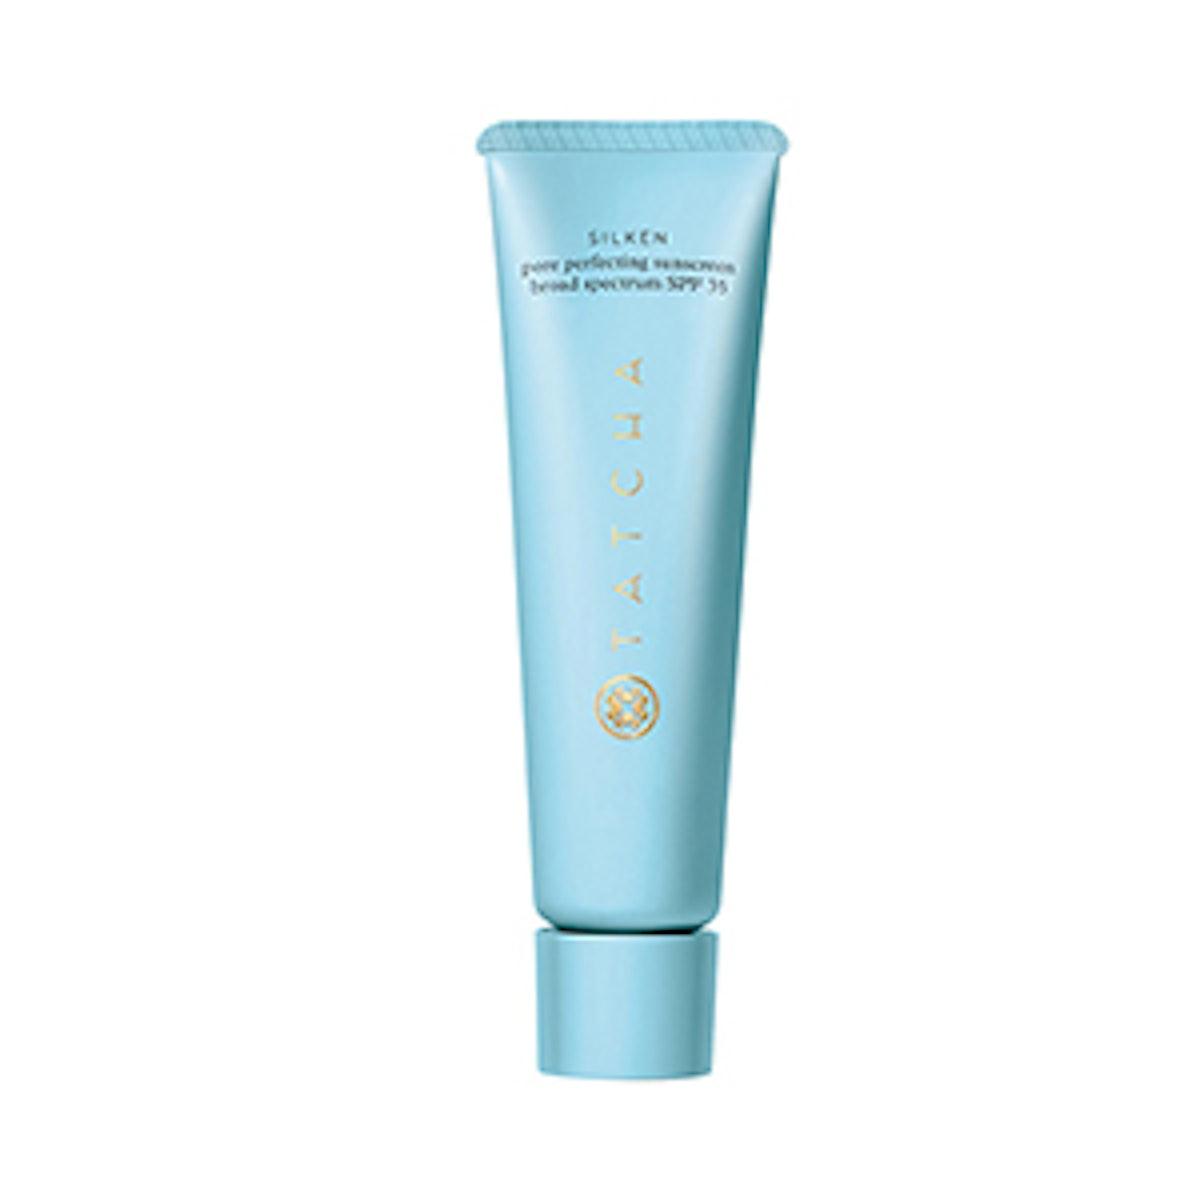 Silken Pore Perfecting Sunscreen Broad Spectrum SPF 35 PA+++